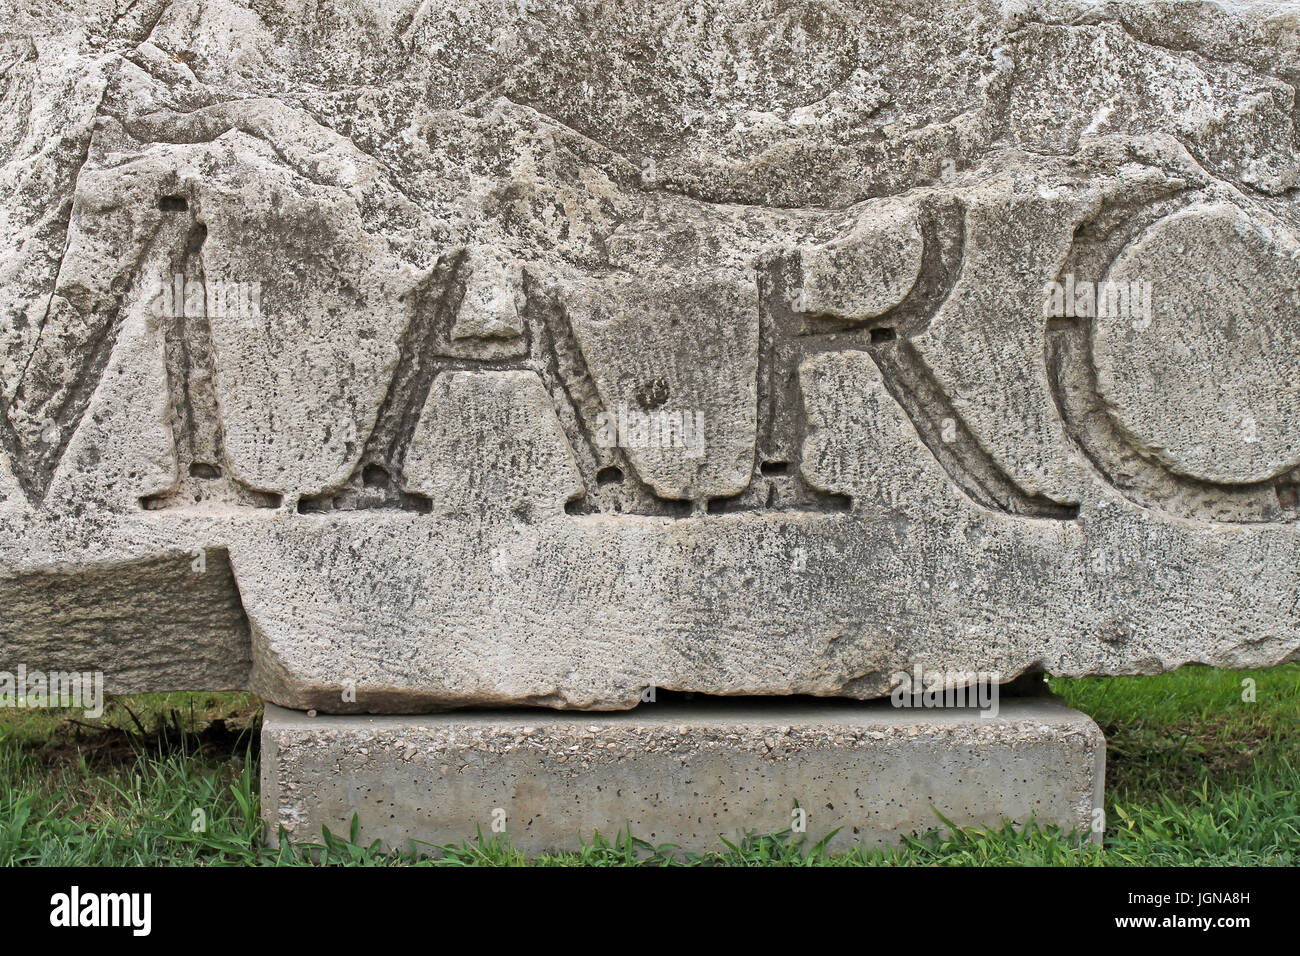 Artefact of Roman forum. City of Zadar. Croatia. - Stock Image